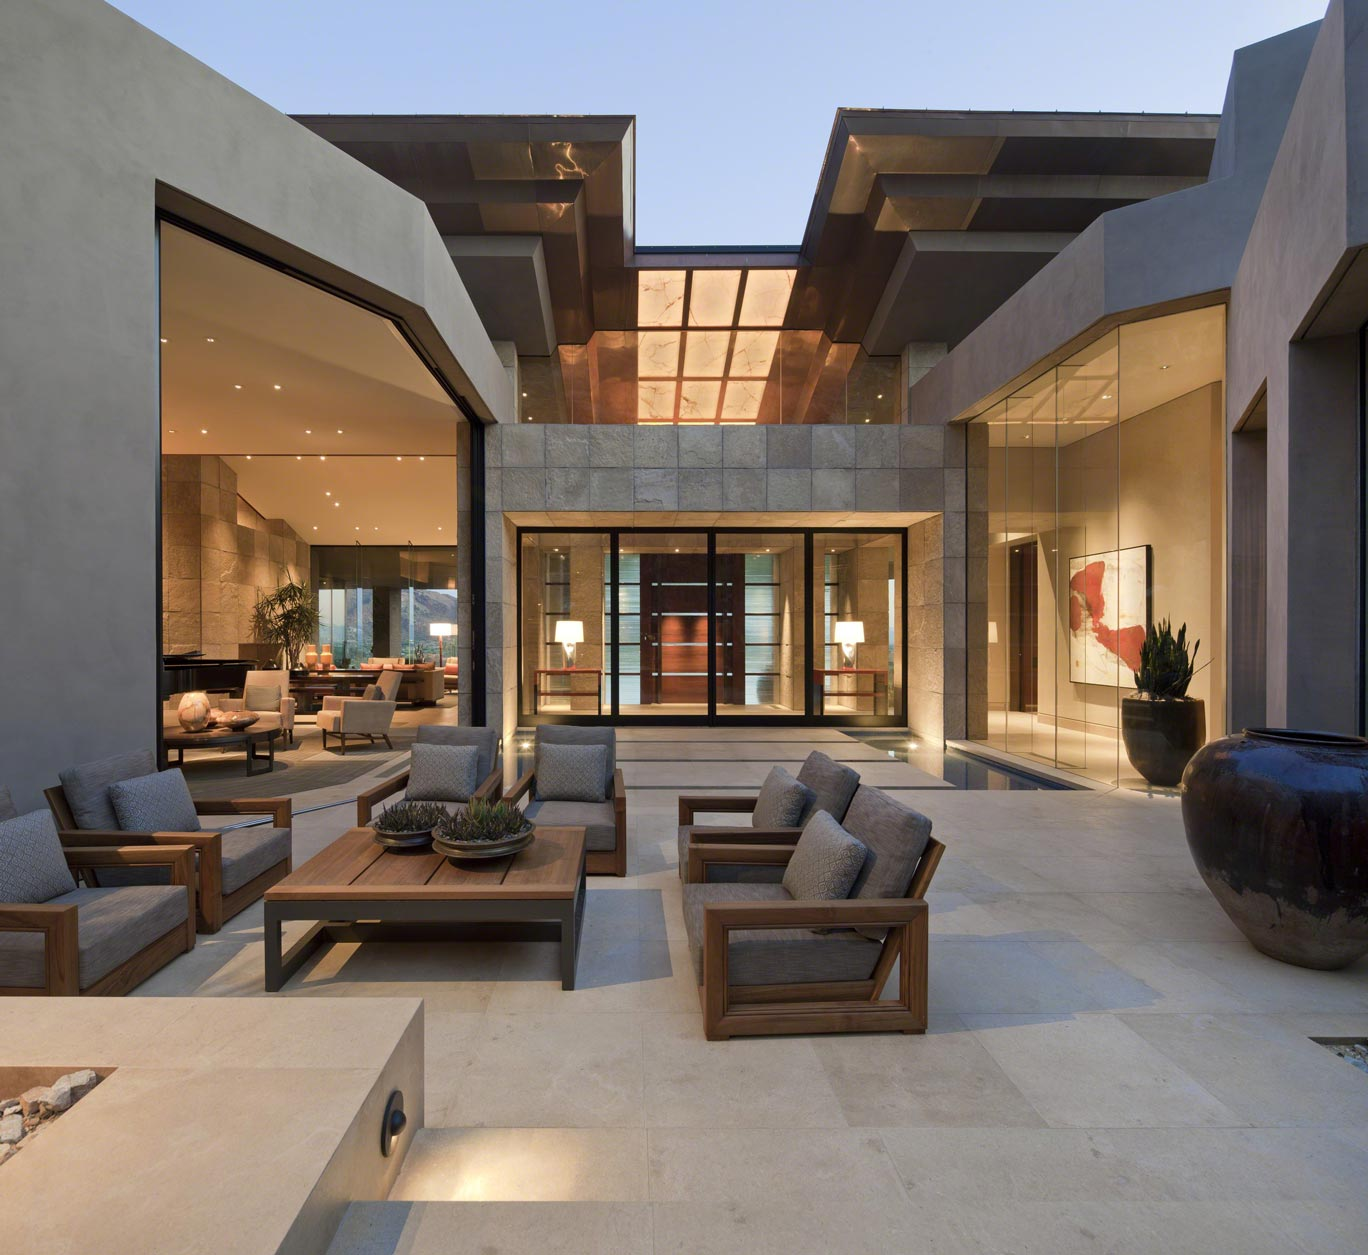 Contemporary Outdoor Living Design in Phoenix ǀ David ... on Designer Outdoor Living id=53099